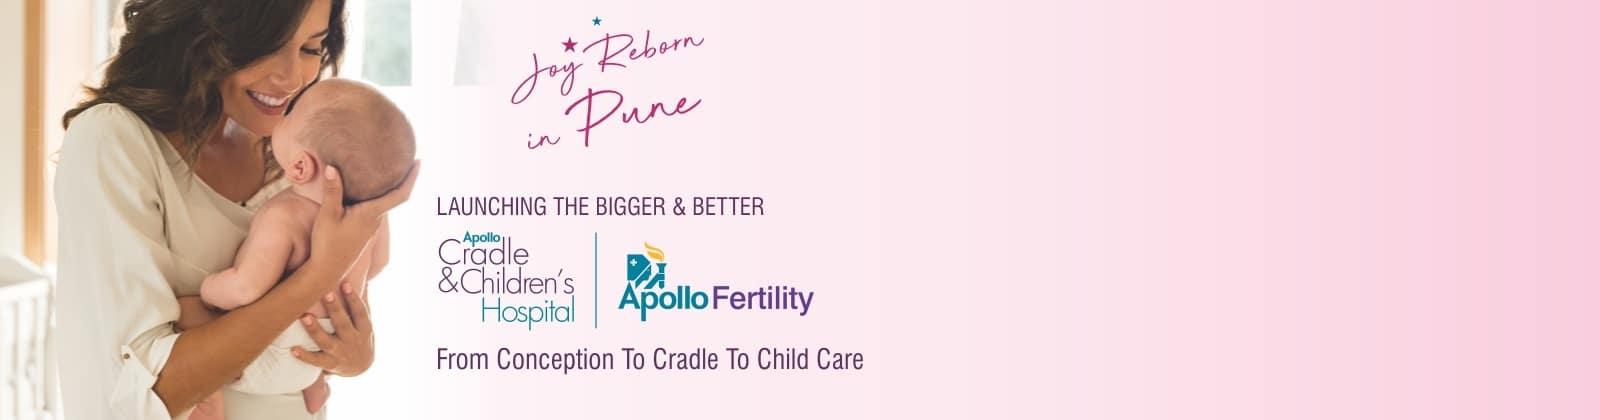 Cradle-Pune-Web-Banner-1